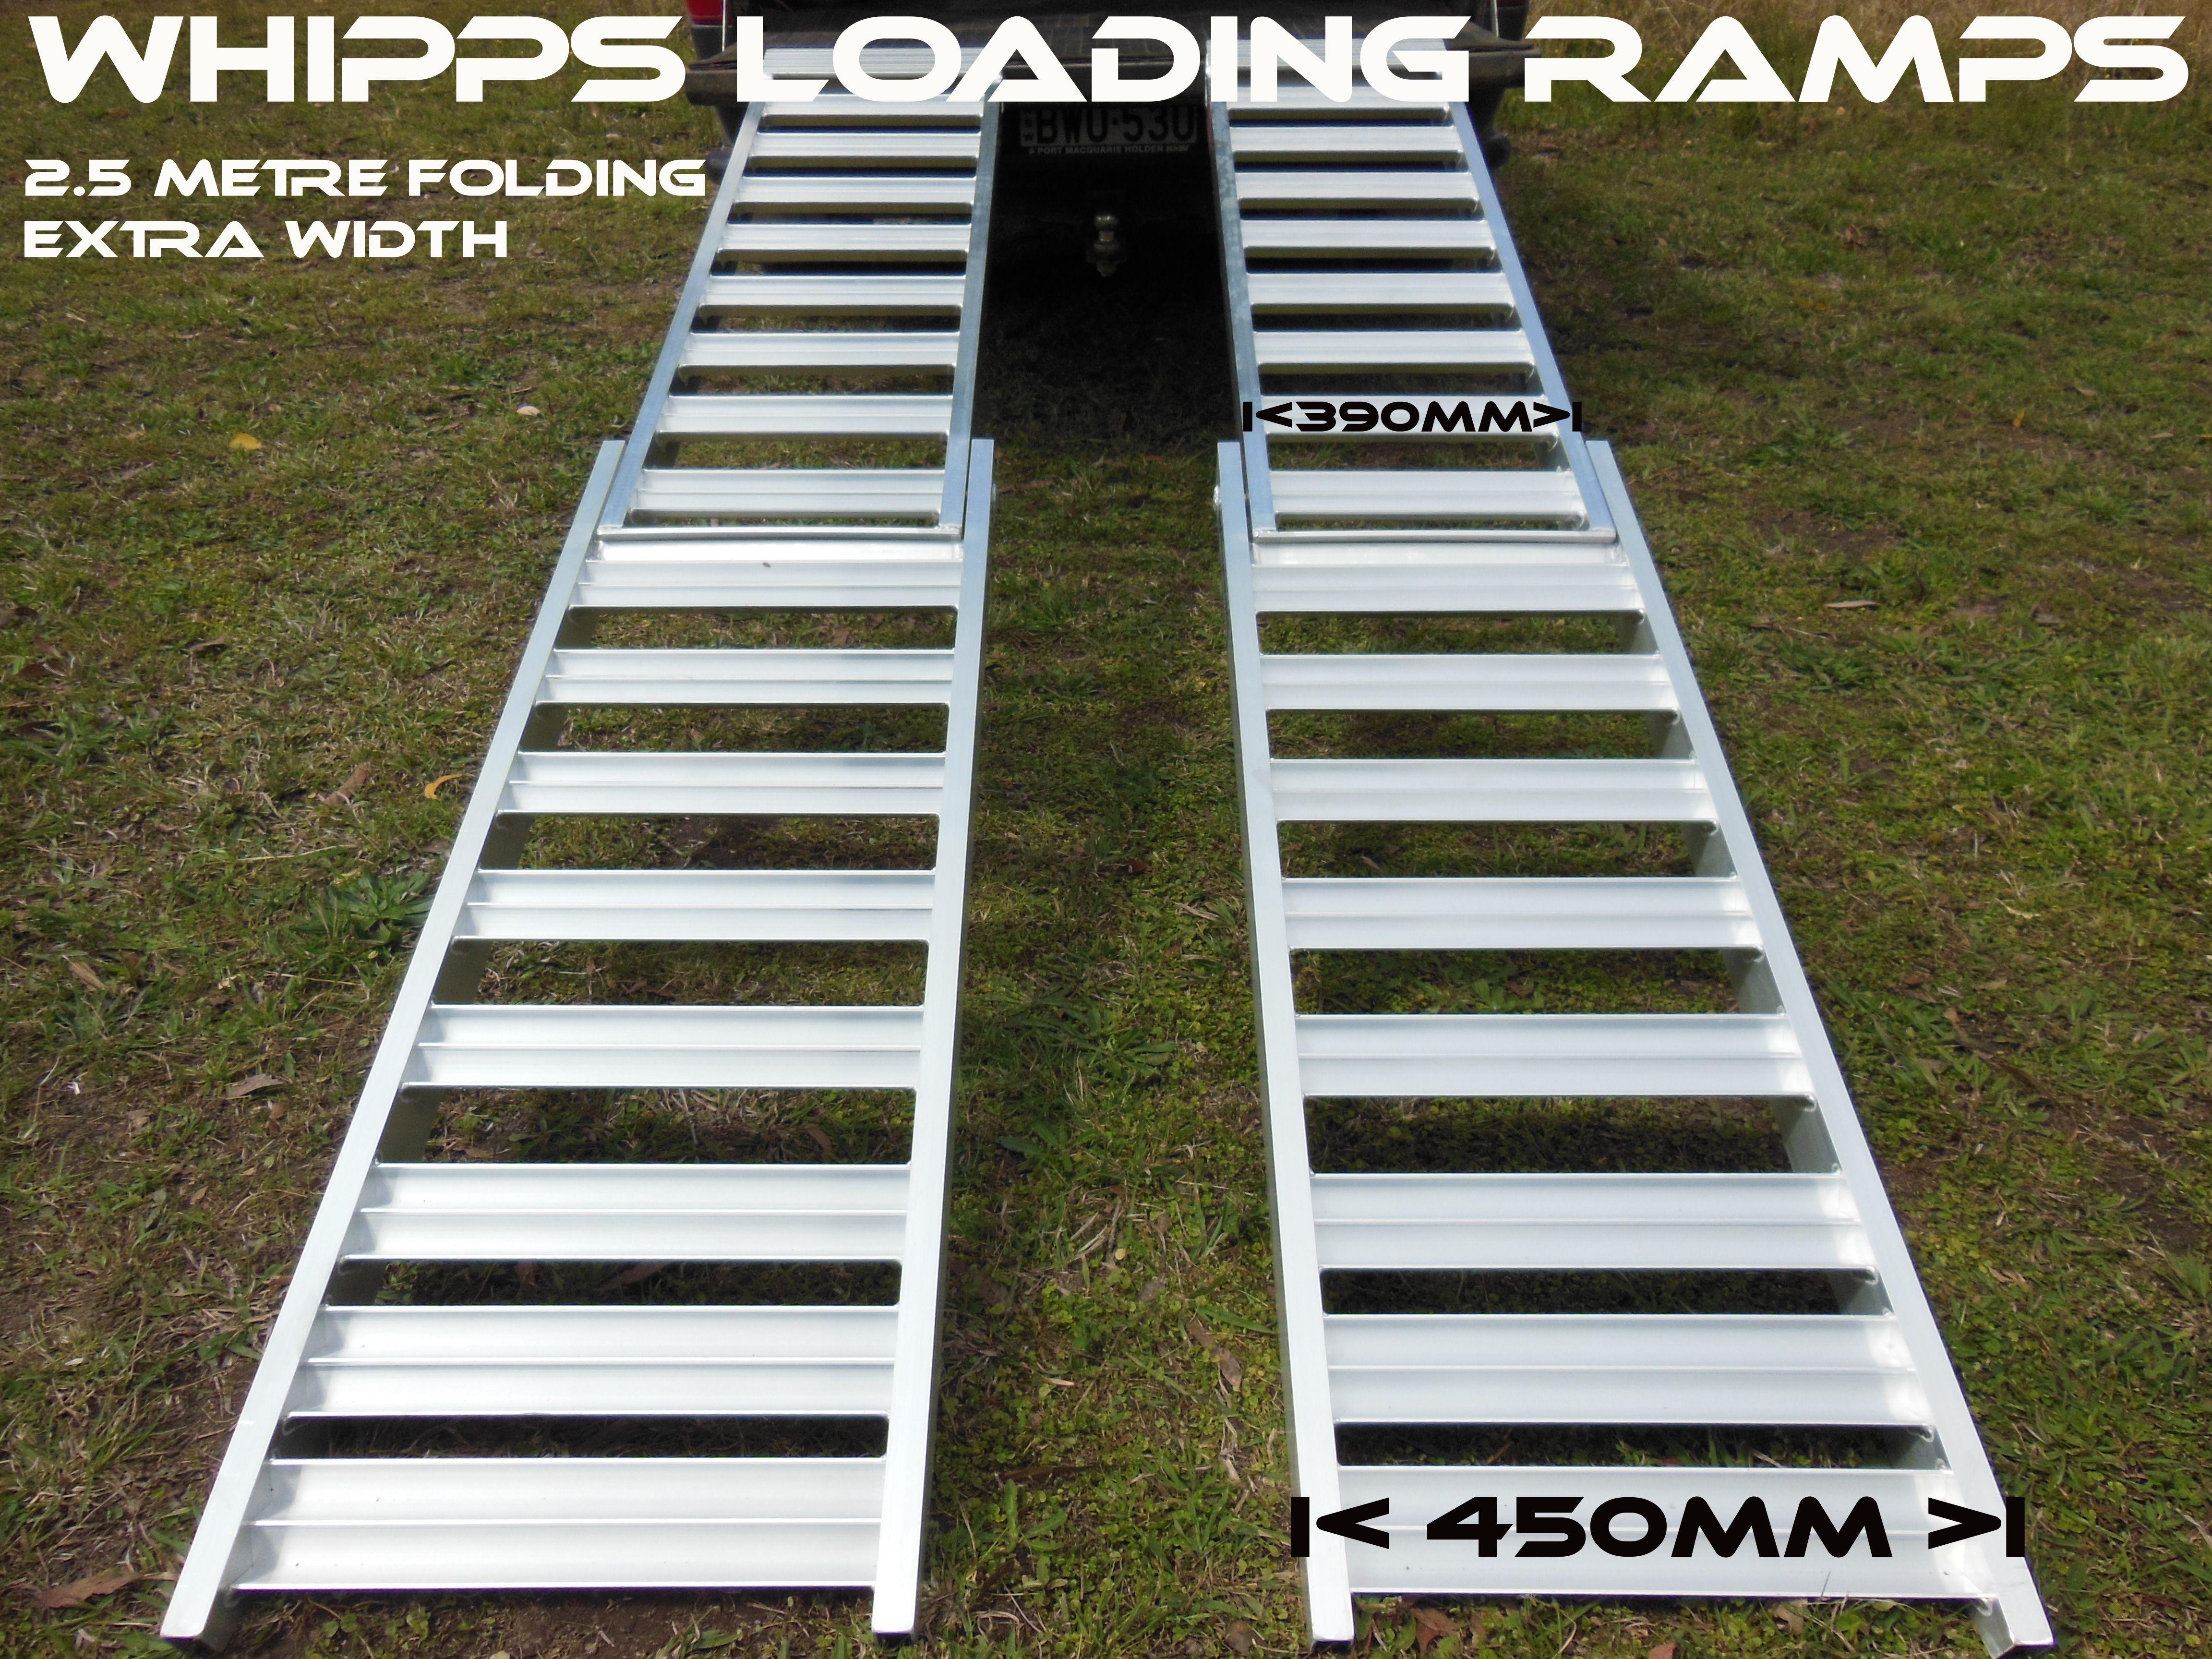 Quality Australian Made Quad Bike Loading Ramps, ATV Ramps, UTV ramps, Structural aluminium loading ramps